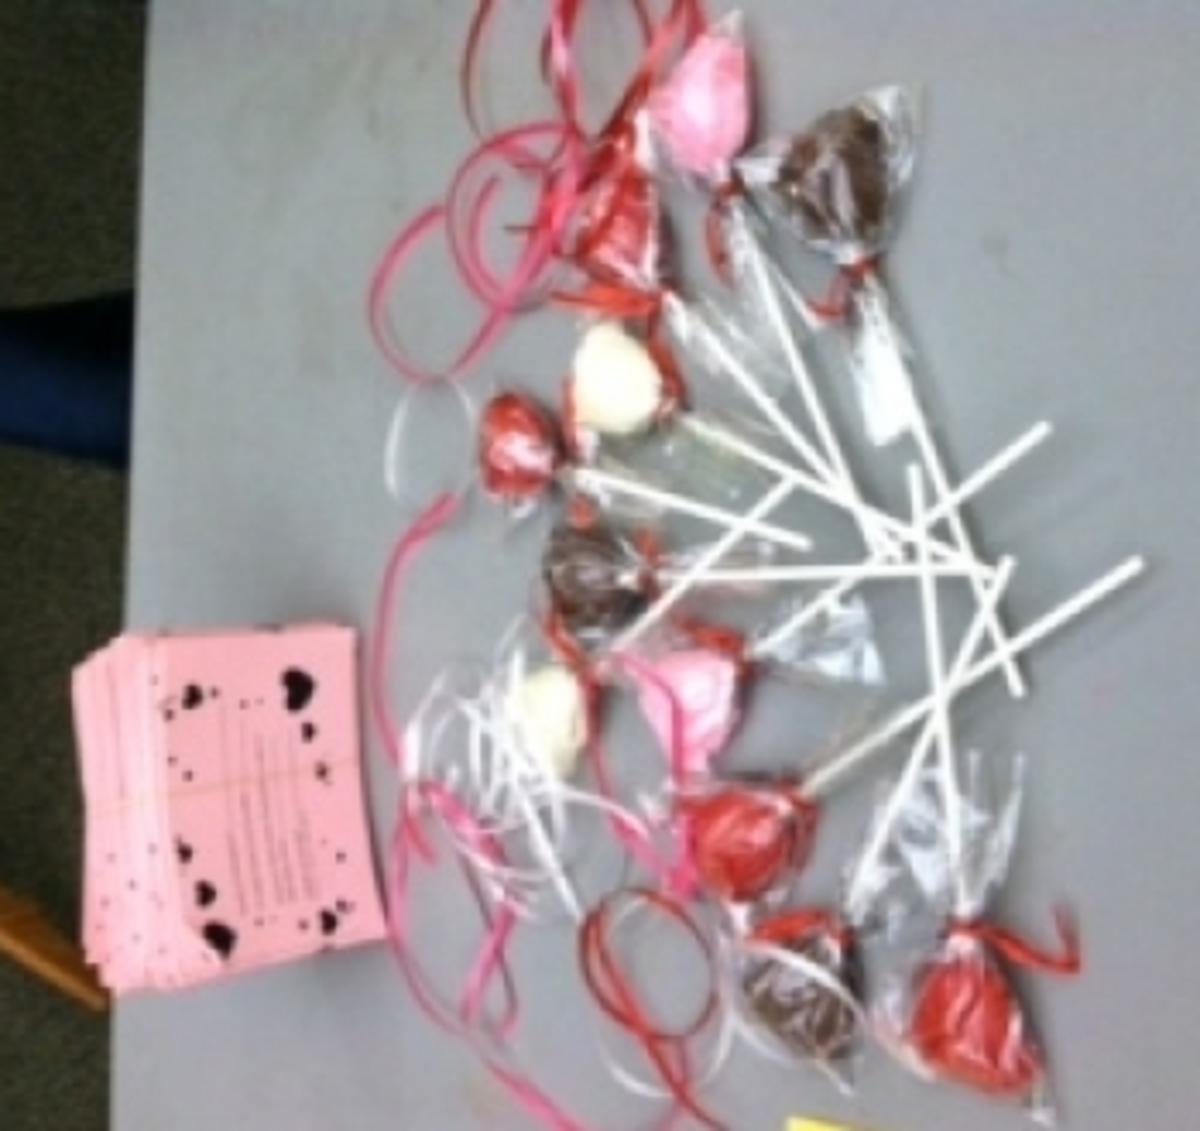 Chocolate Roses spread love